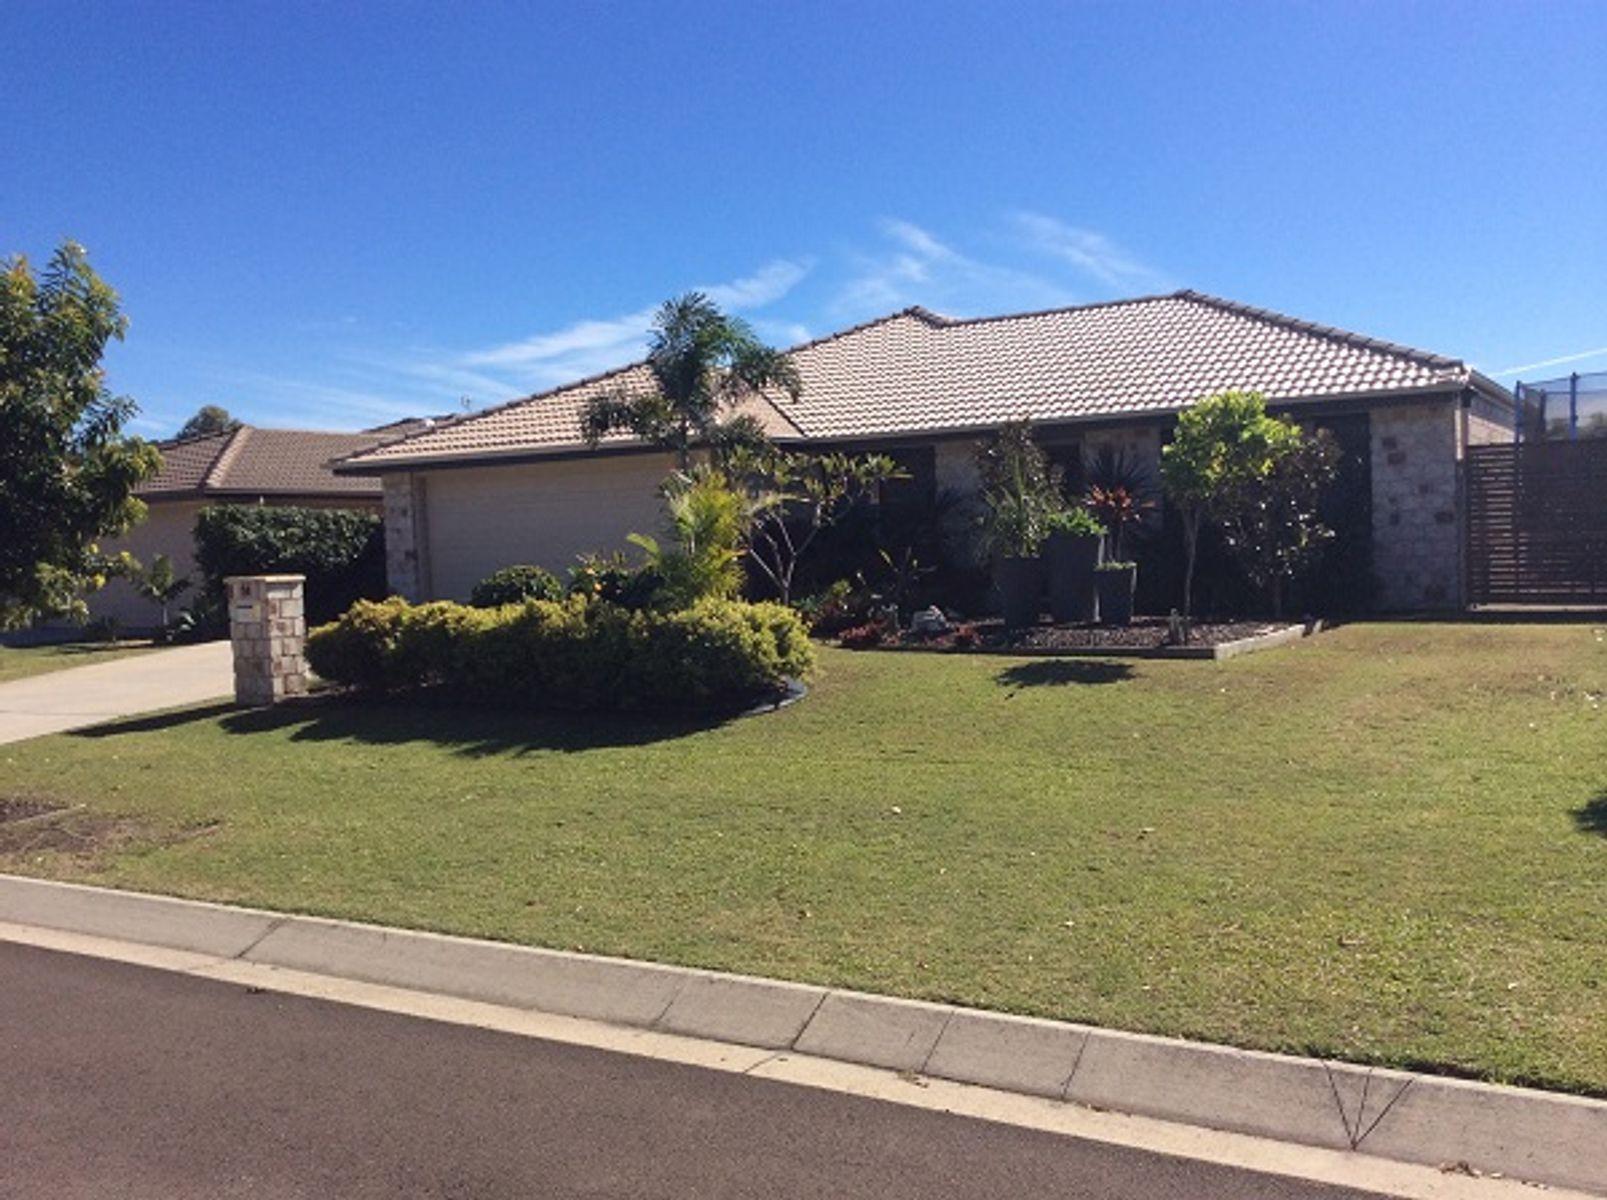 14 Feathertail Street, Bli Bli, QLD 4560